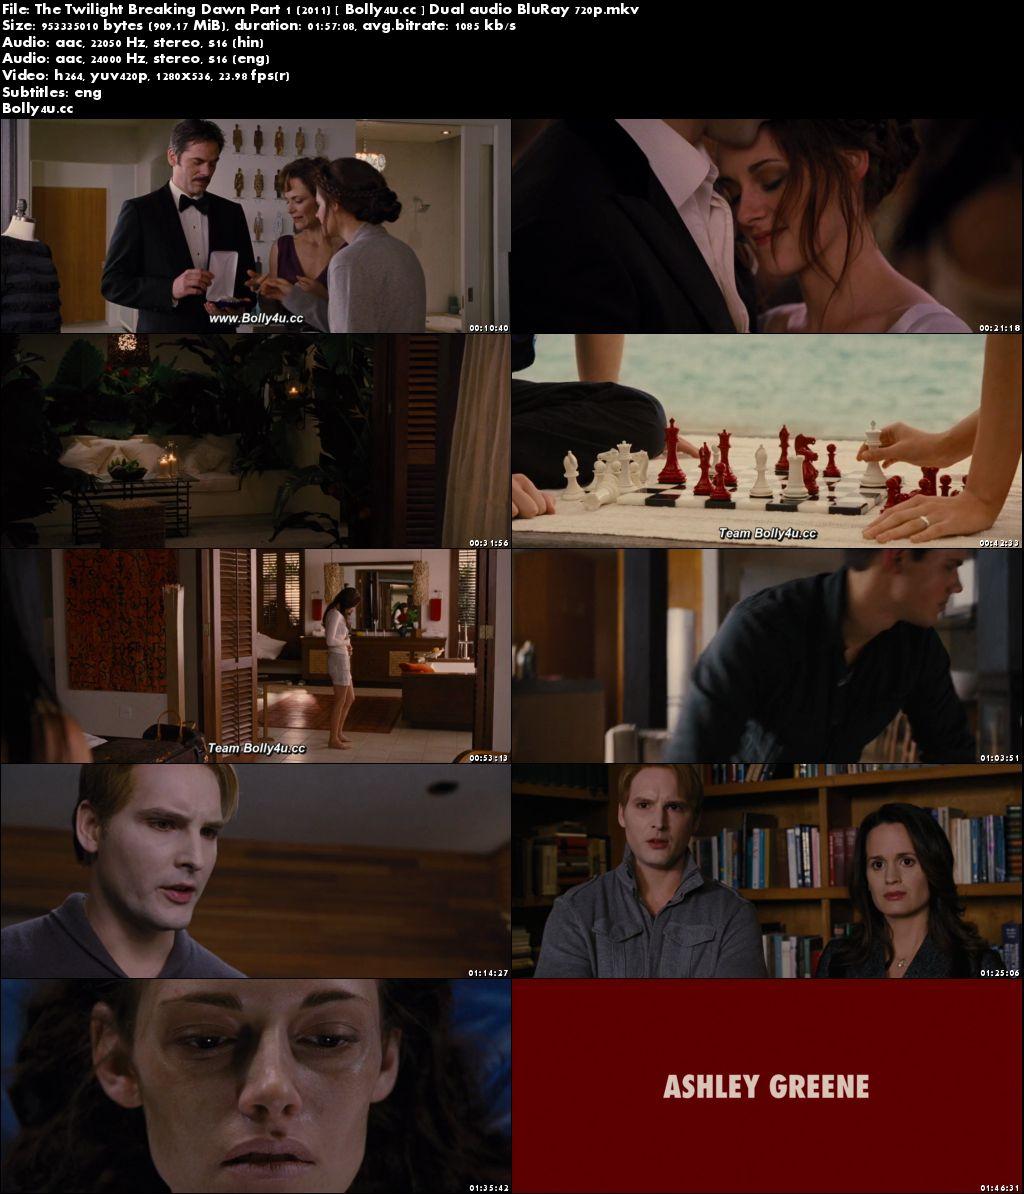 The Twilight Breaking Dawn Part 1 2011 BRRip 900Mb Hindi Dual Audio 720p Download